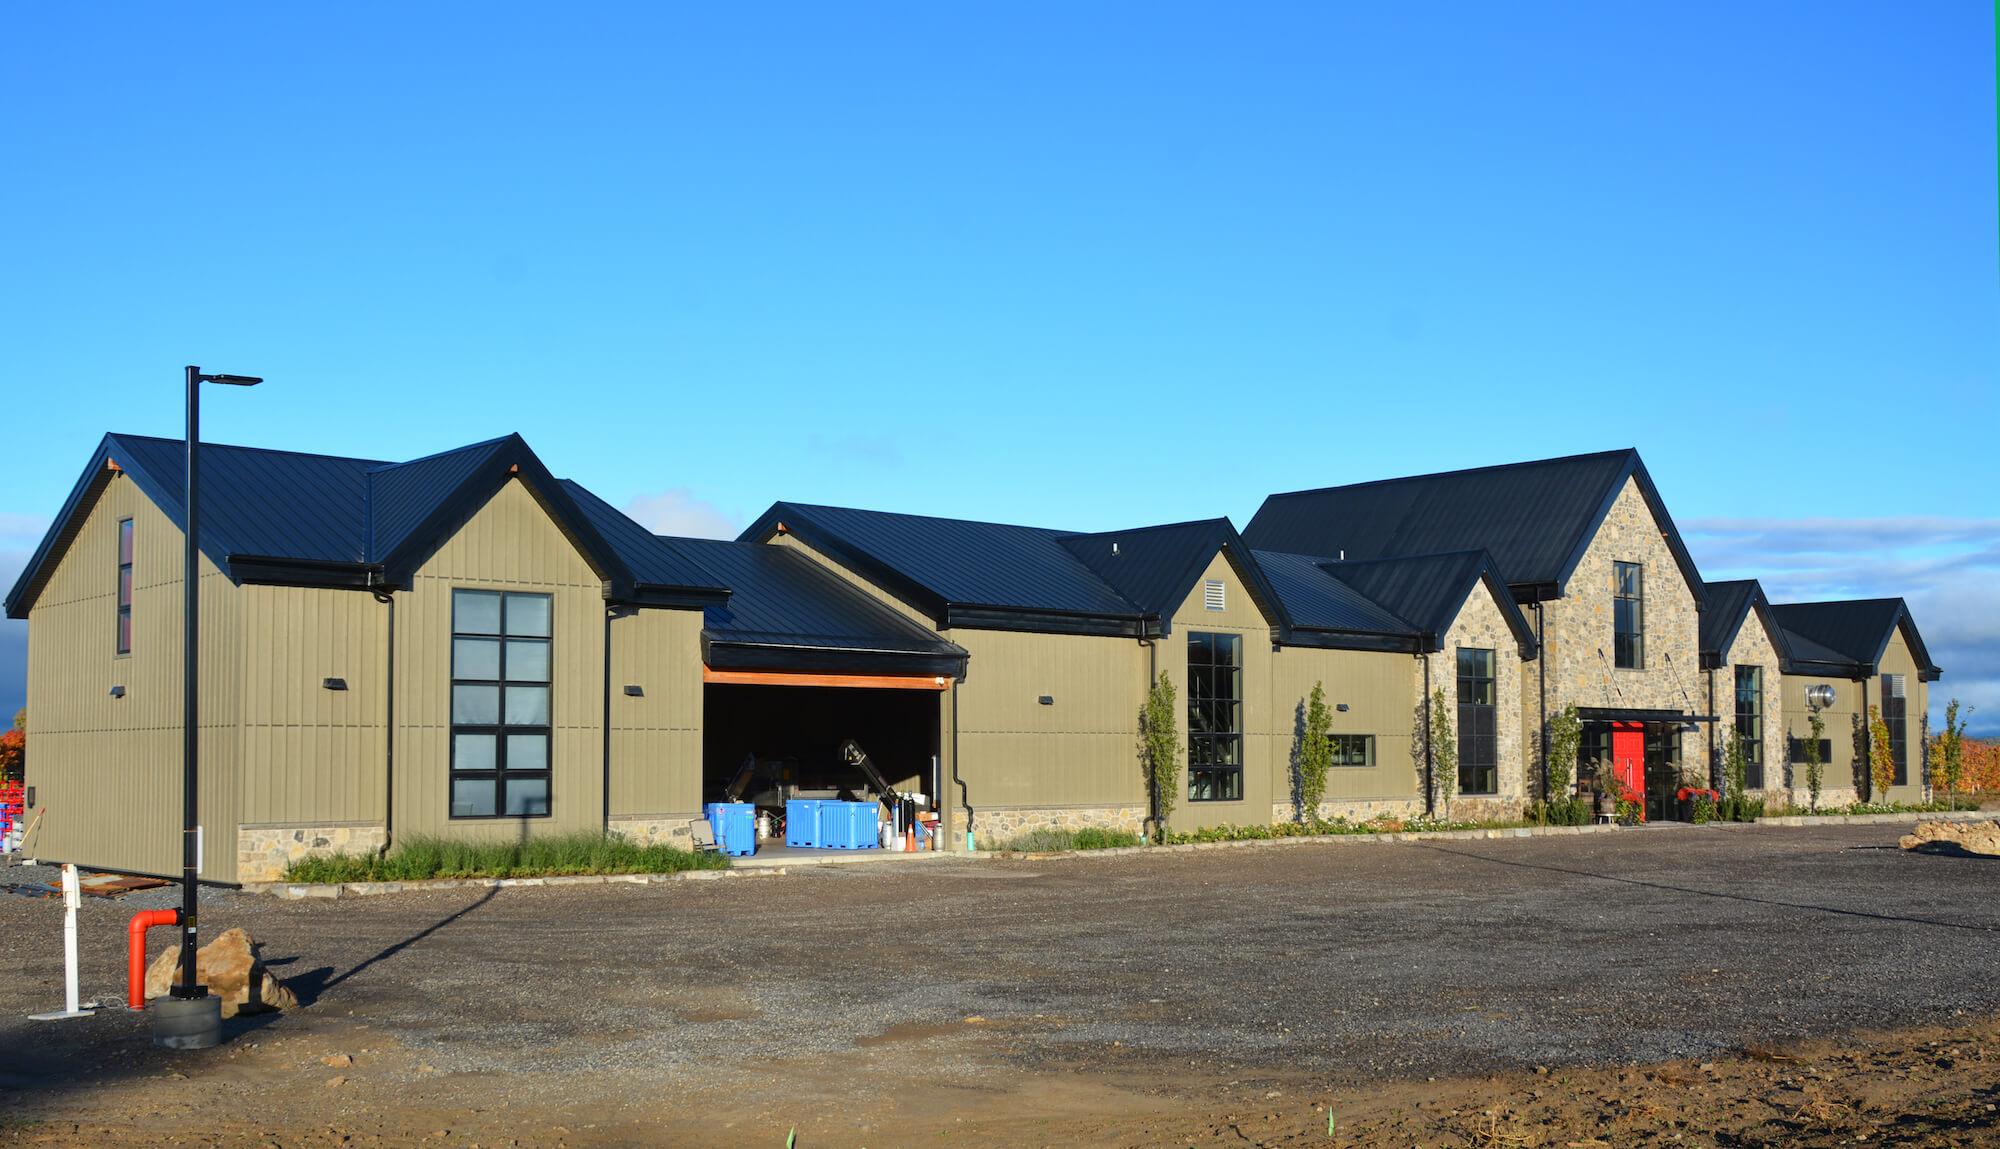 Adamo Estate Winery Amvic Systems